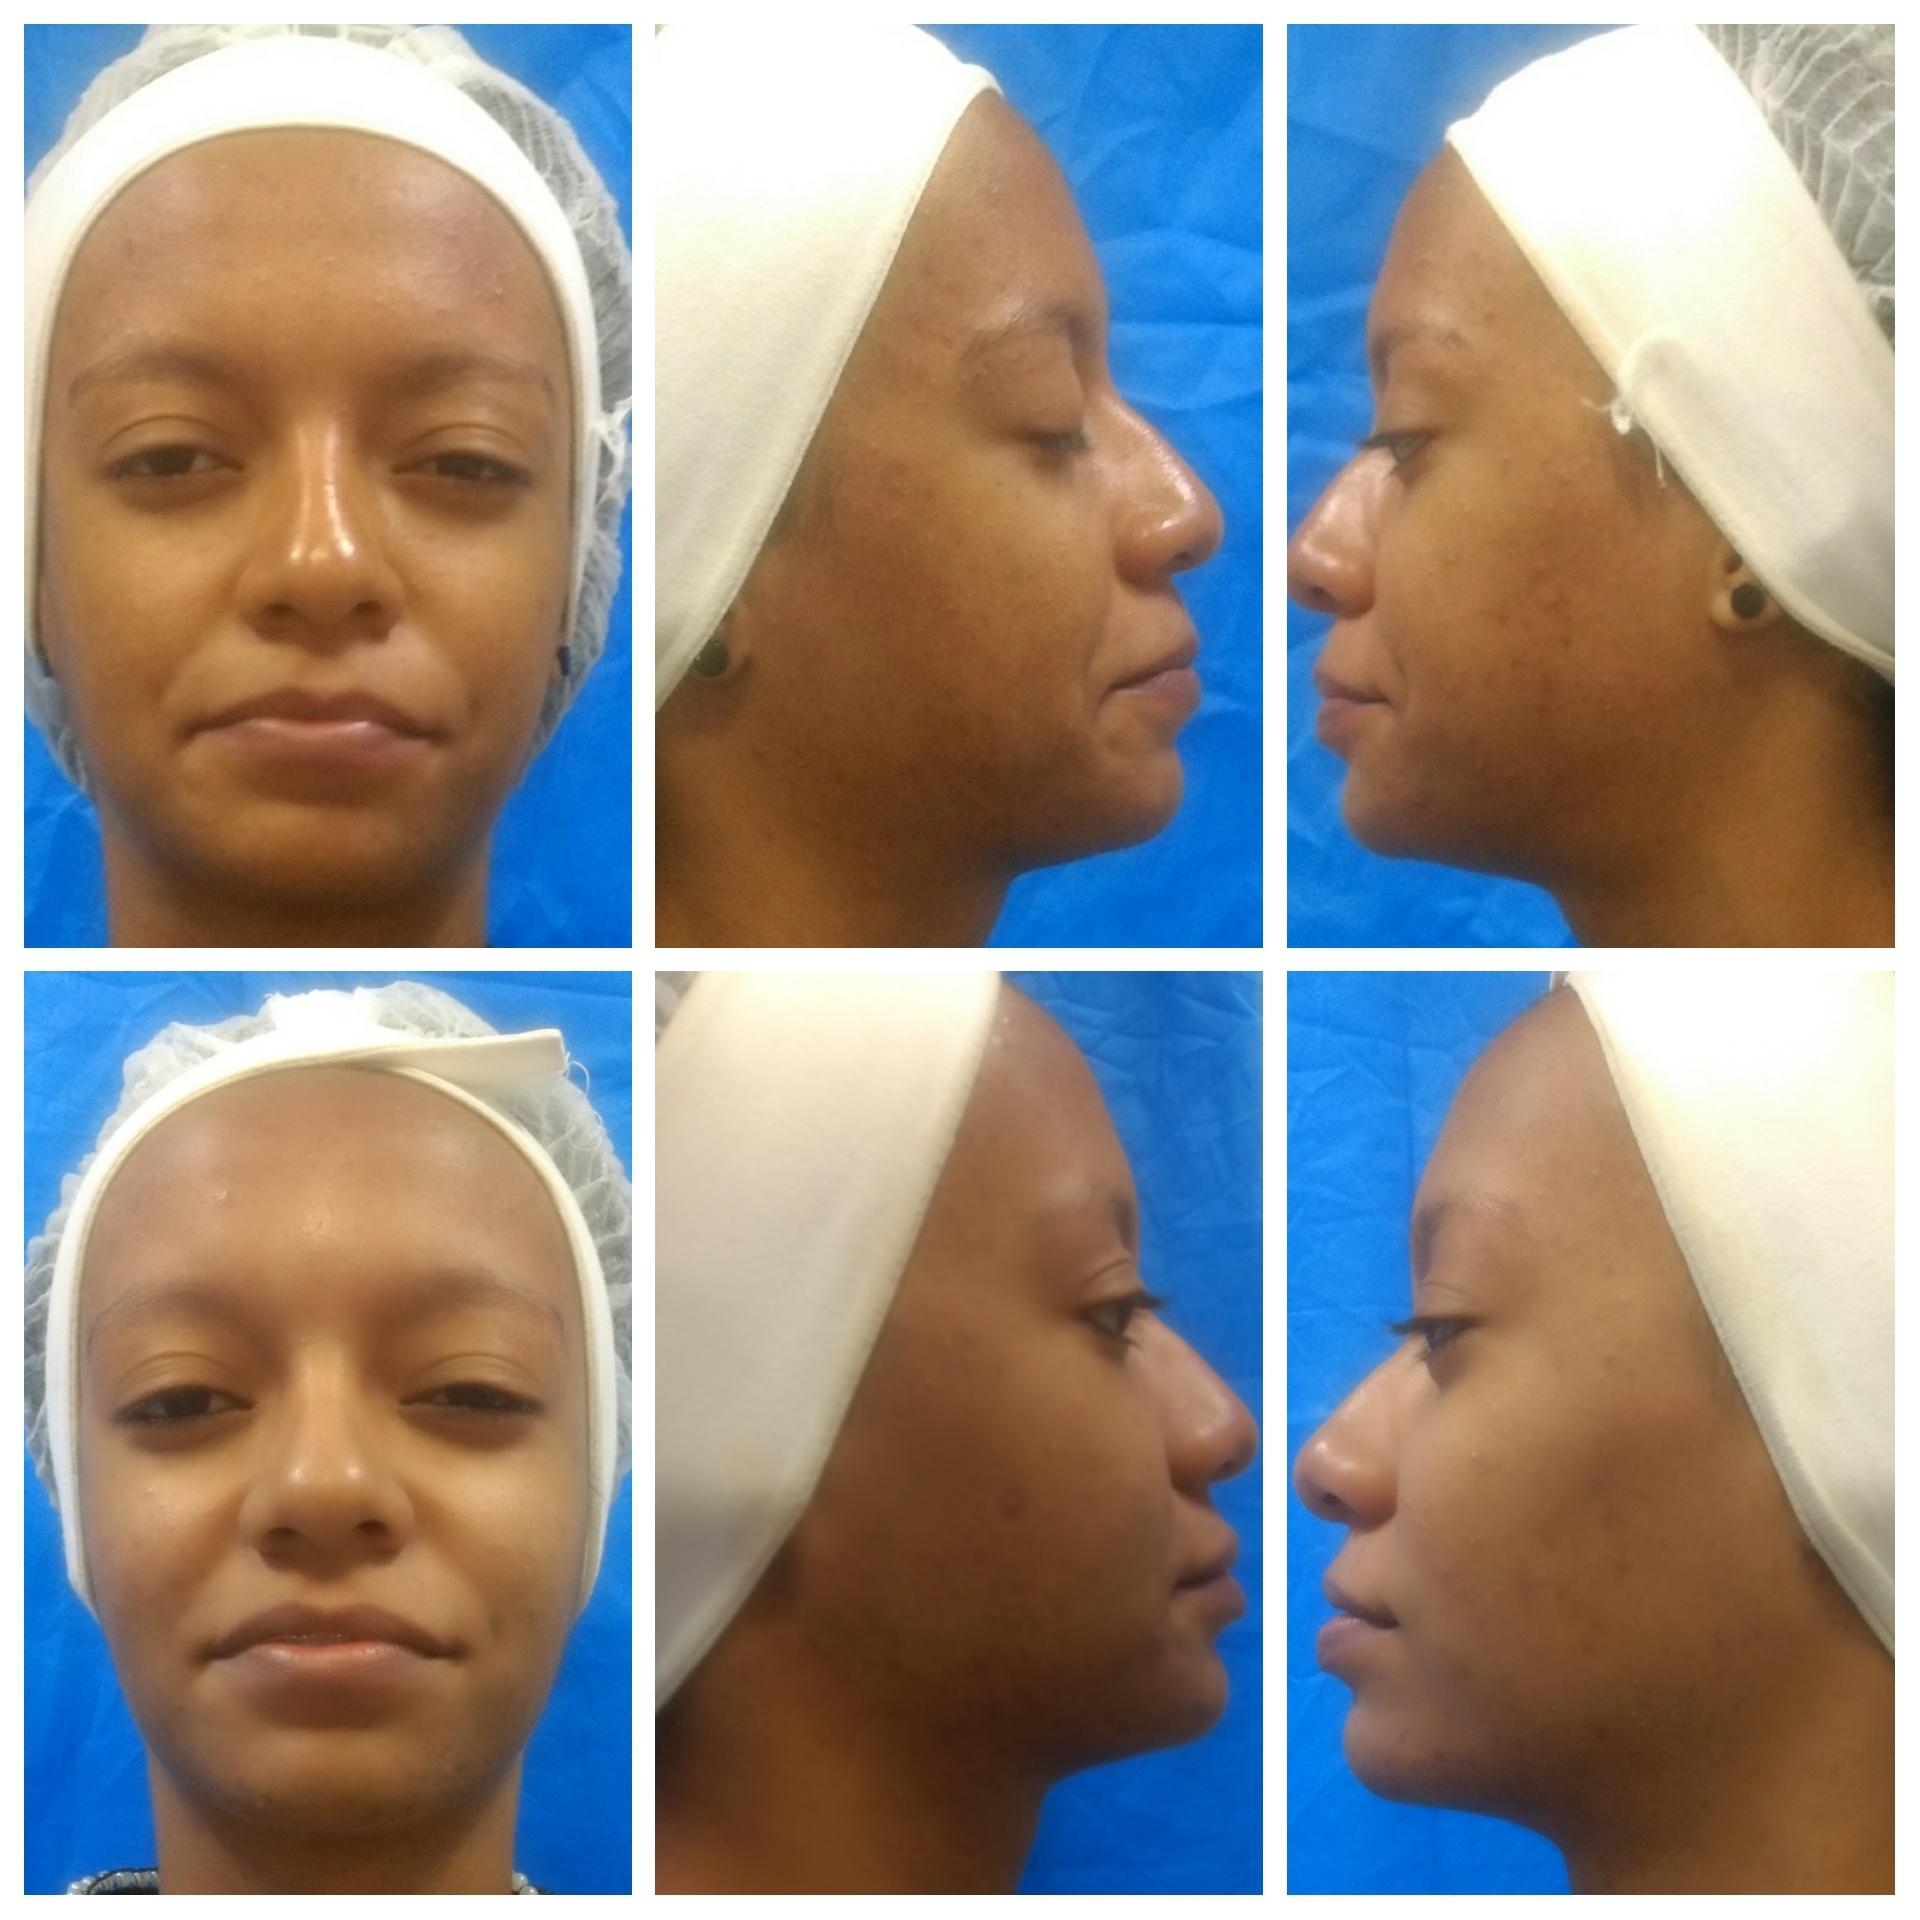 Tratamento de discromia, projeto realizado na faculdade. estética auxiliar cabeleireiro(a) estudante (esteticista)